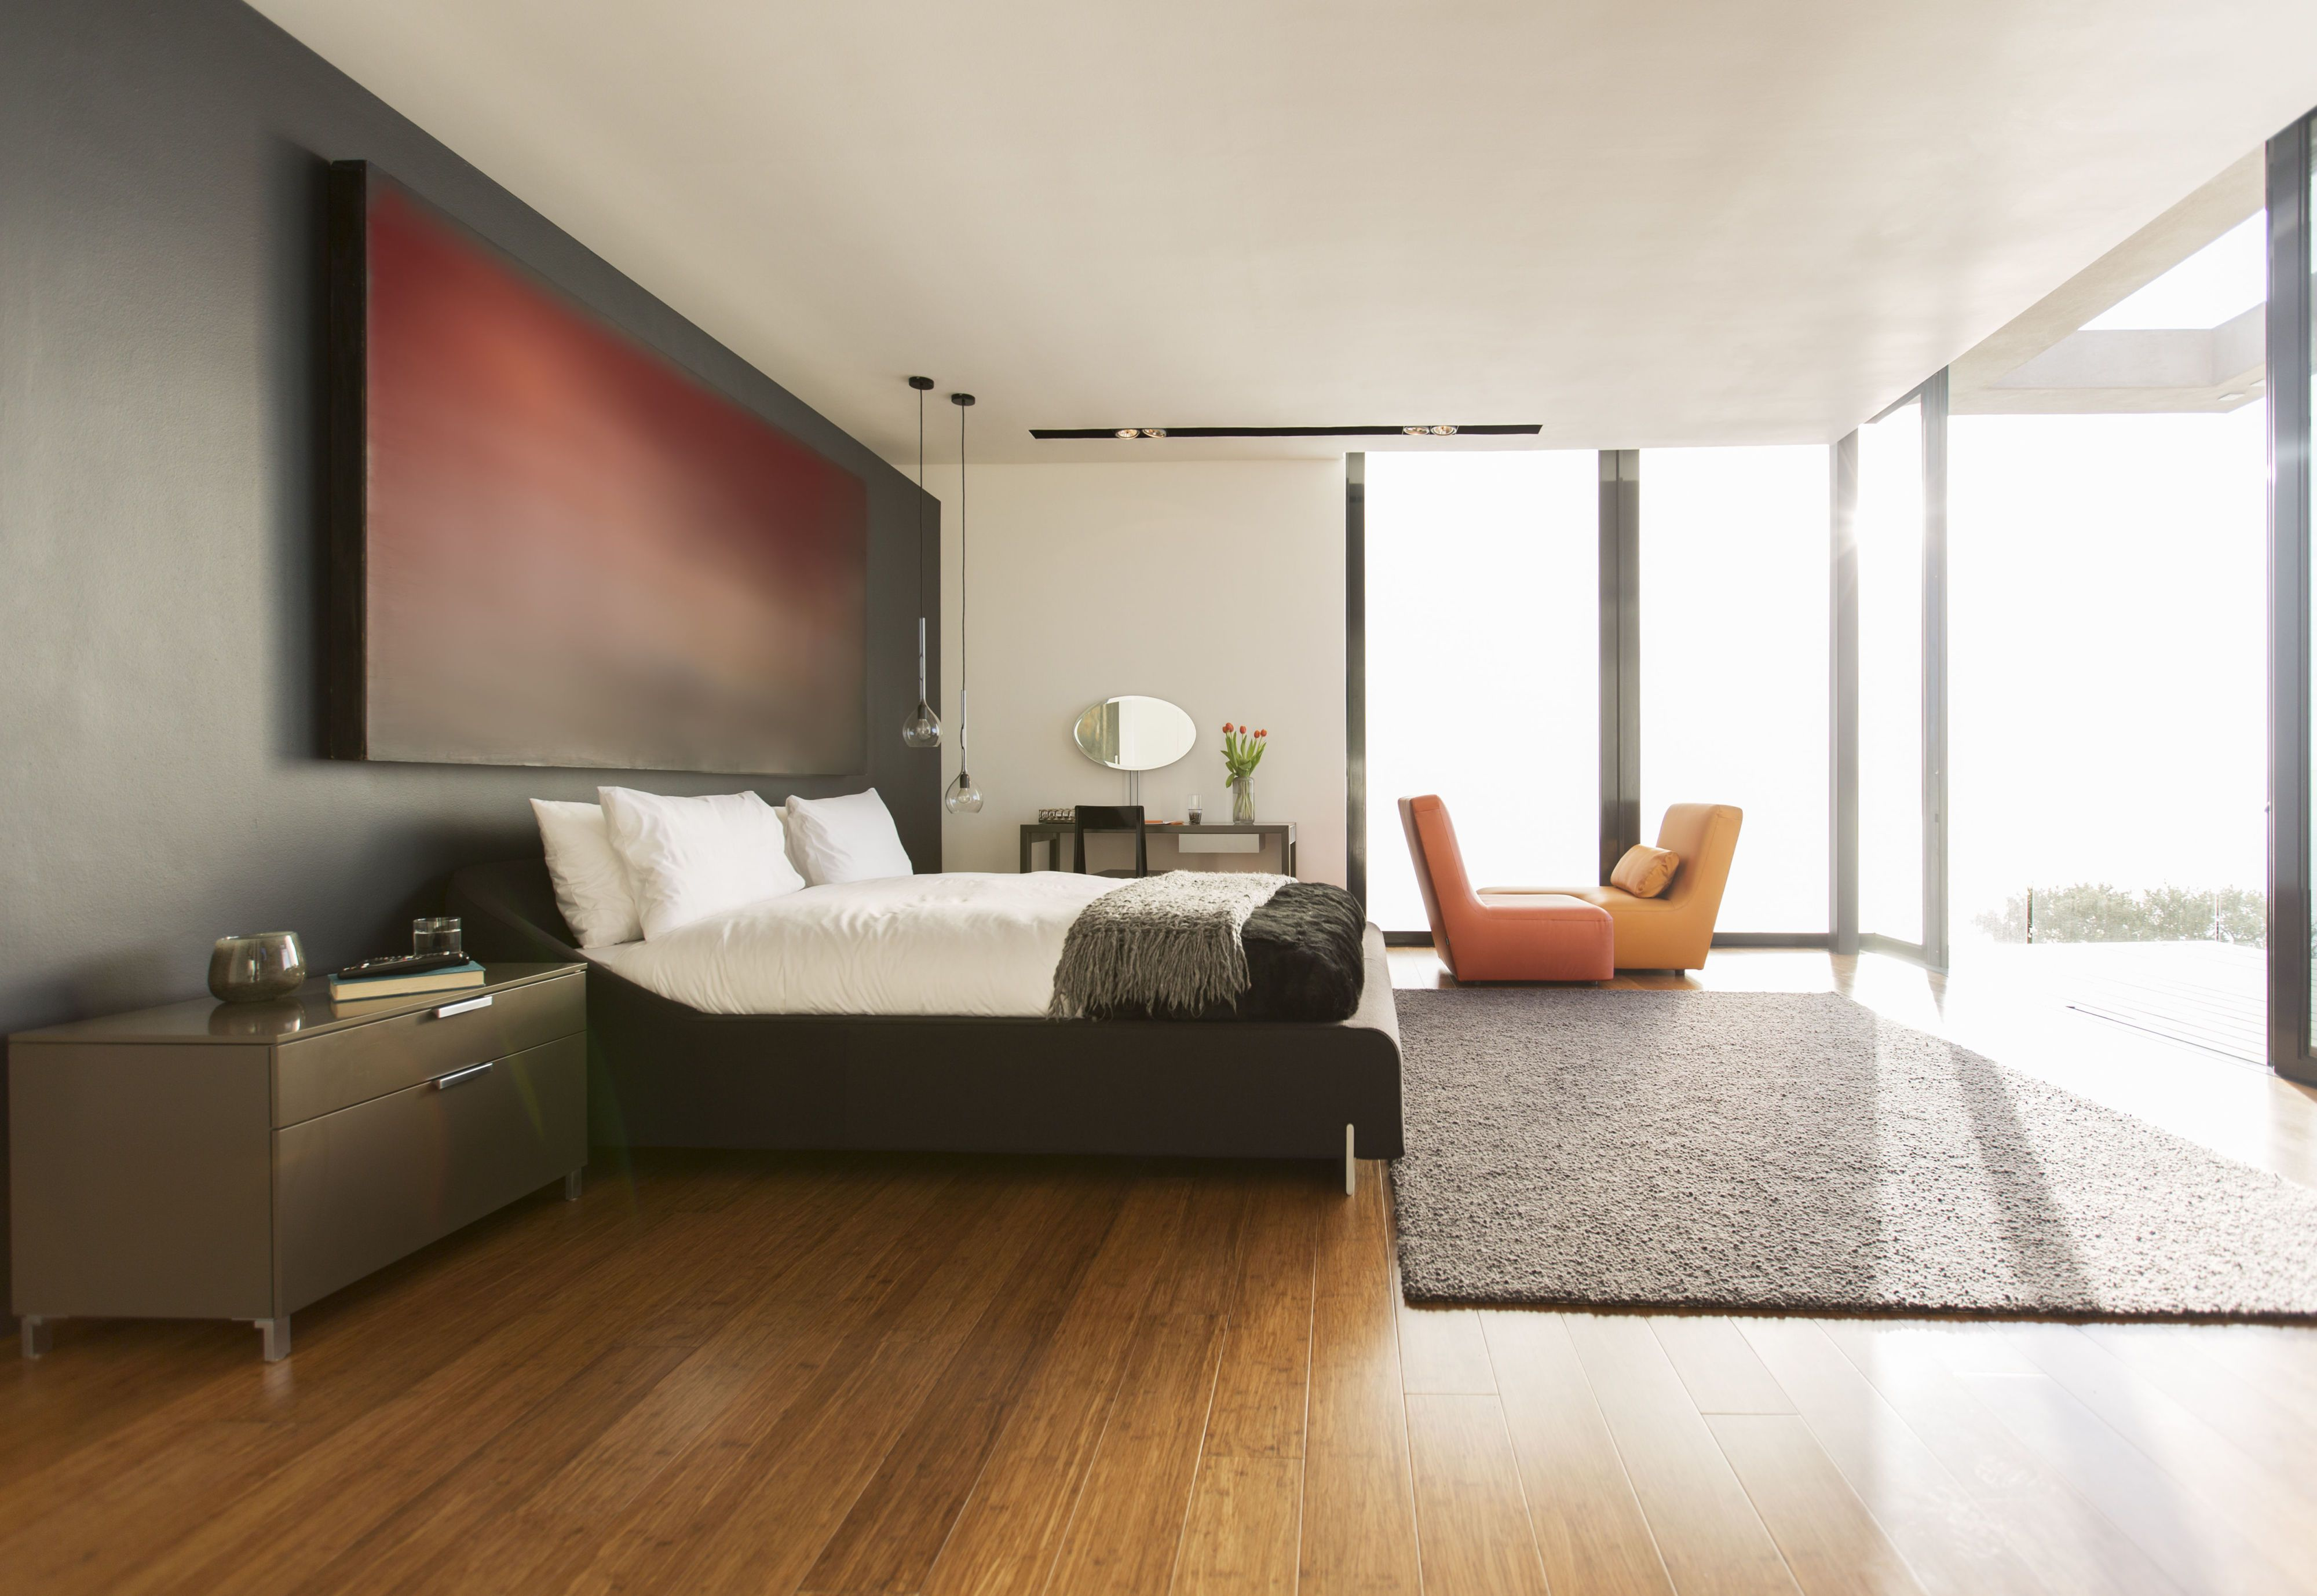 Sexy romantic bedroom decor design ideas